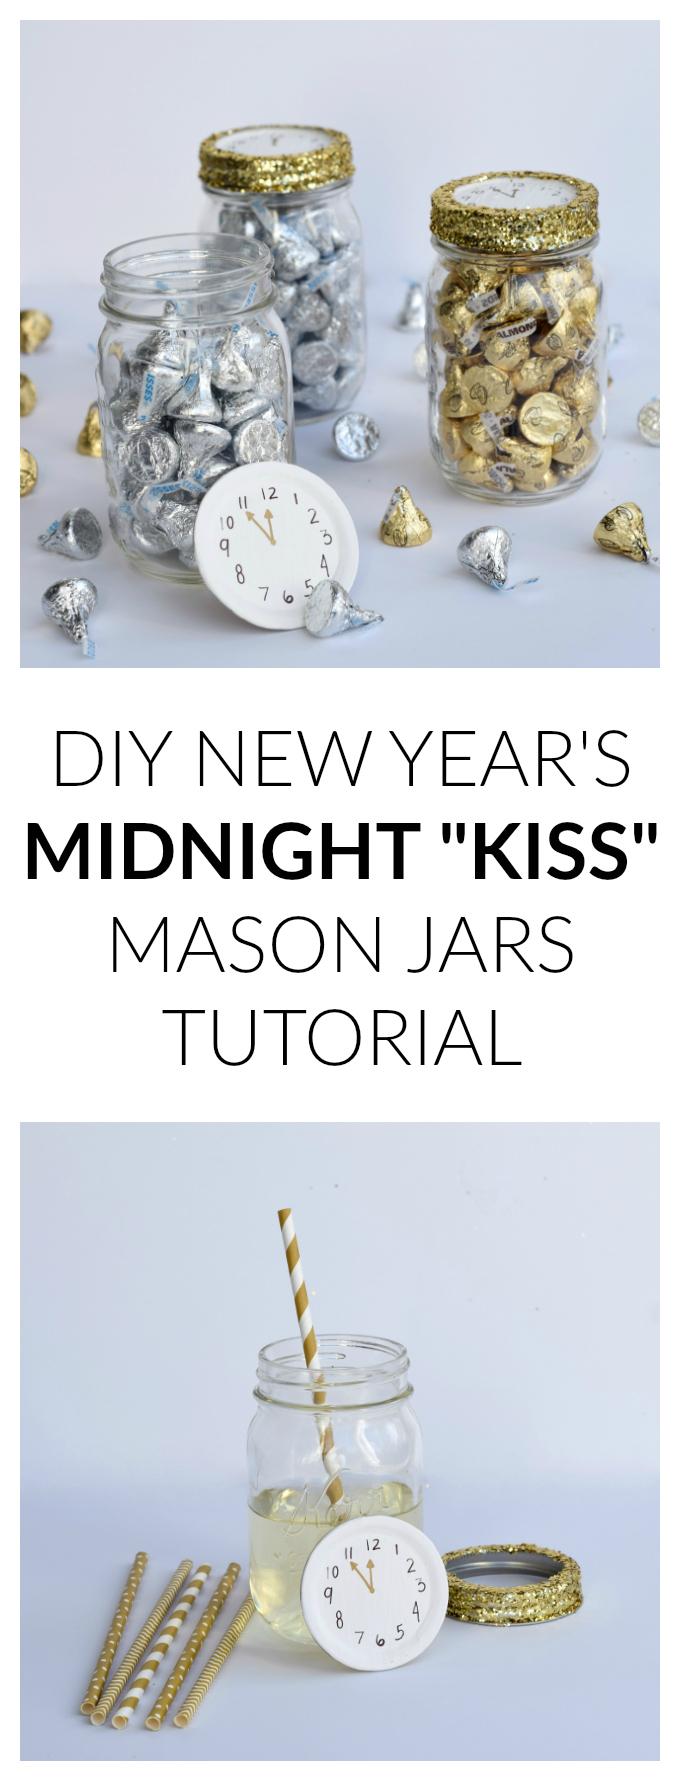 DIY NEW YEAR'S MIDNIGHT MASON JARS TUTORIAL